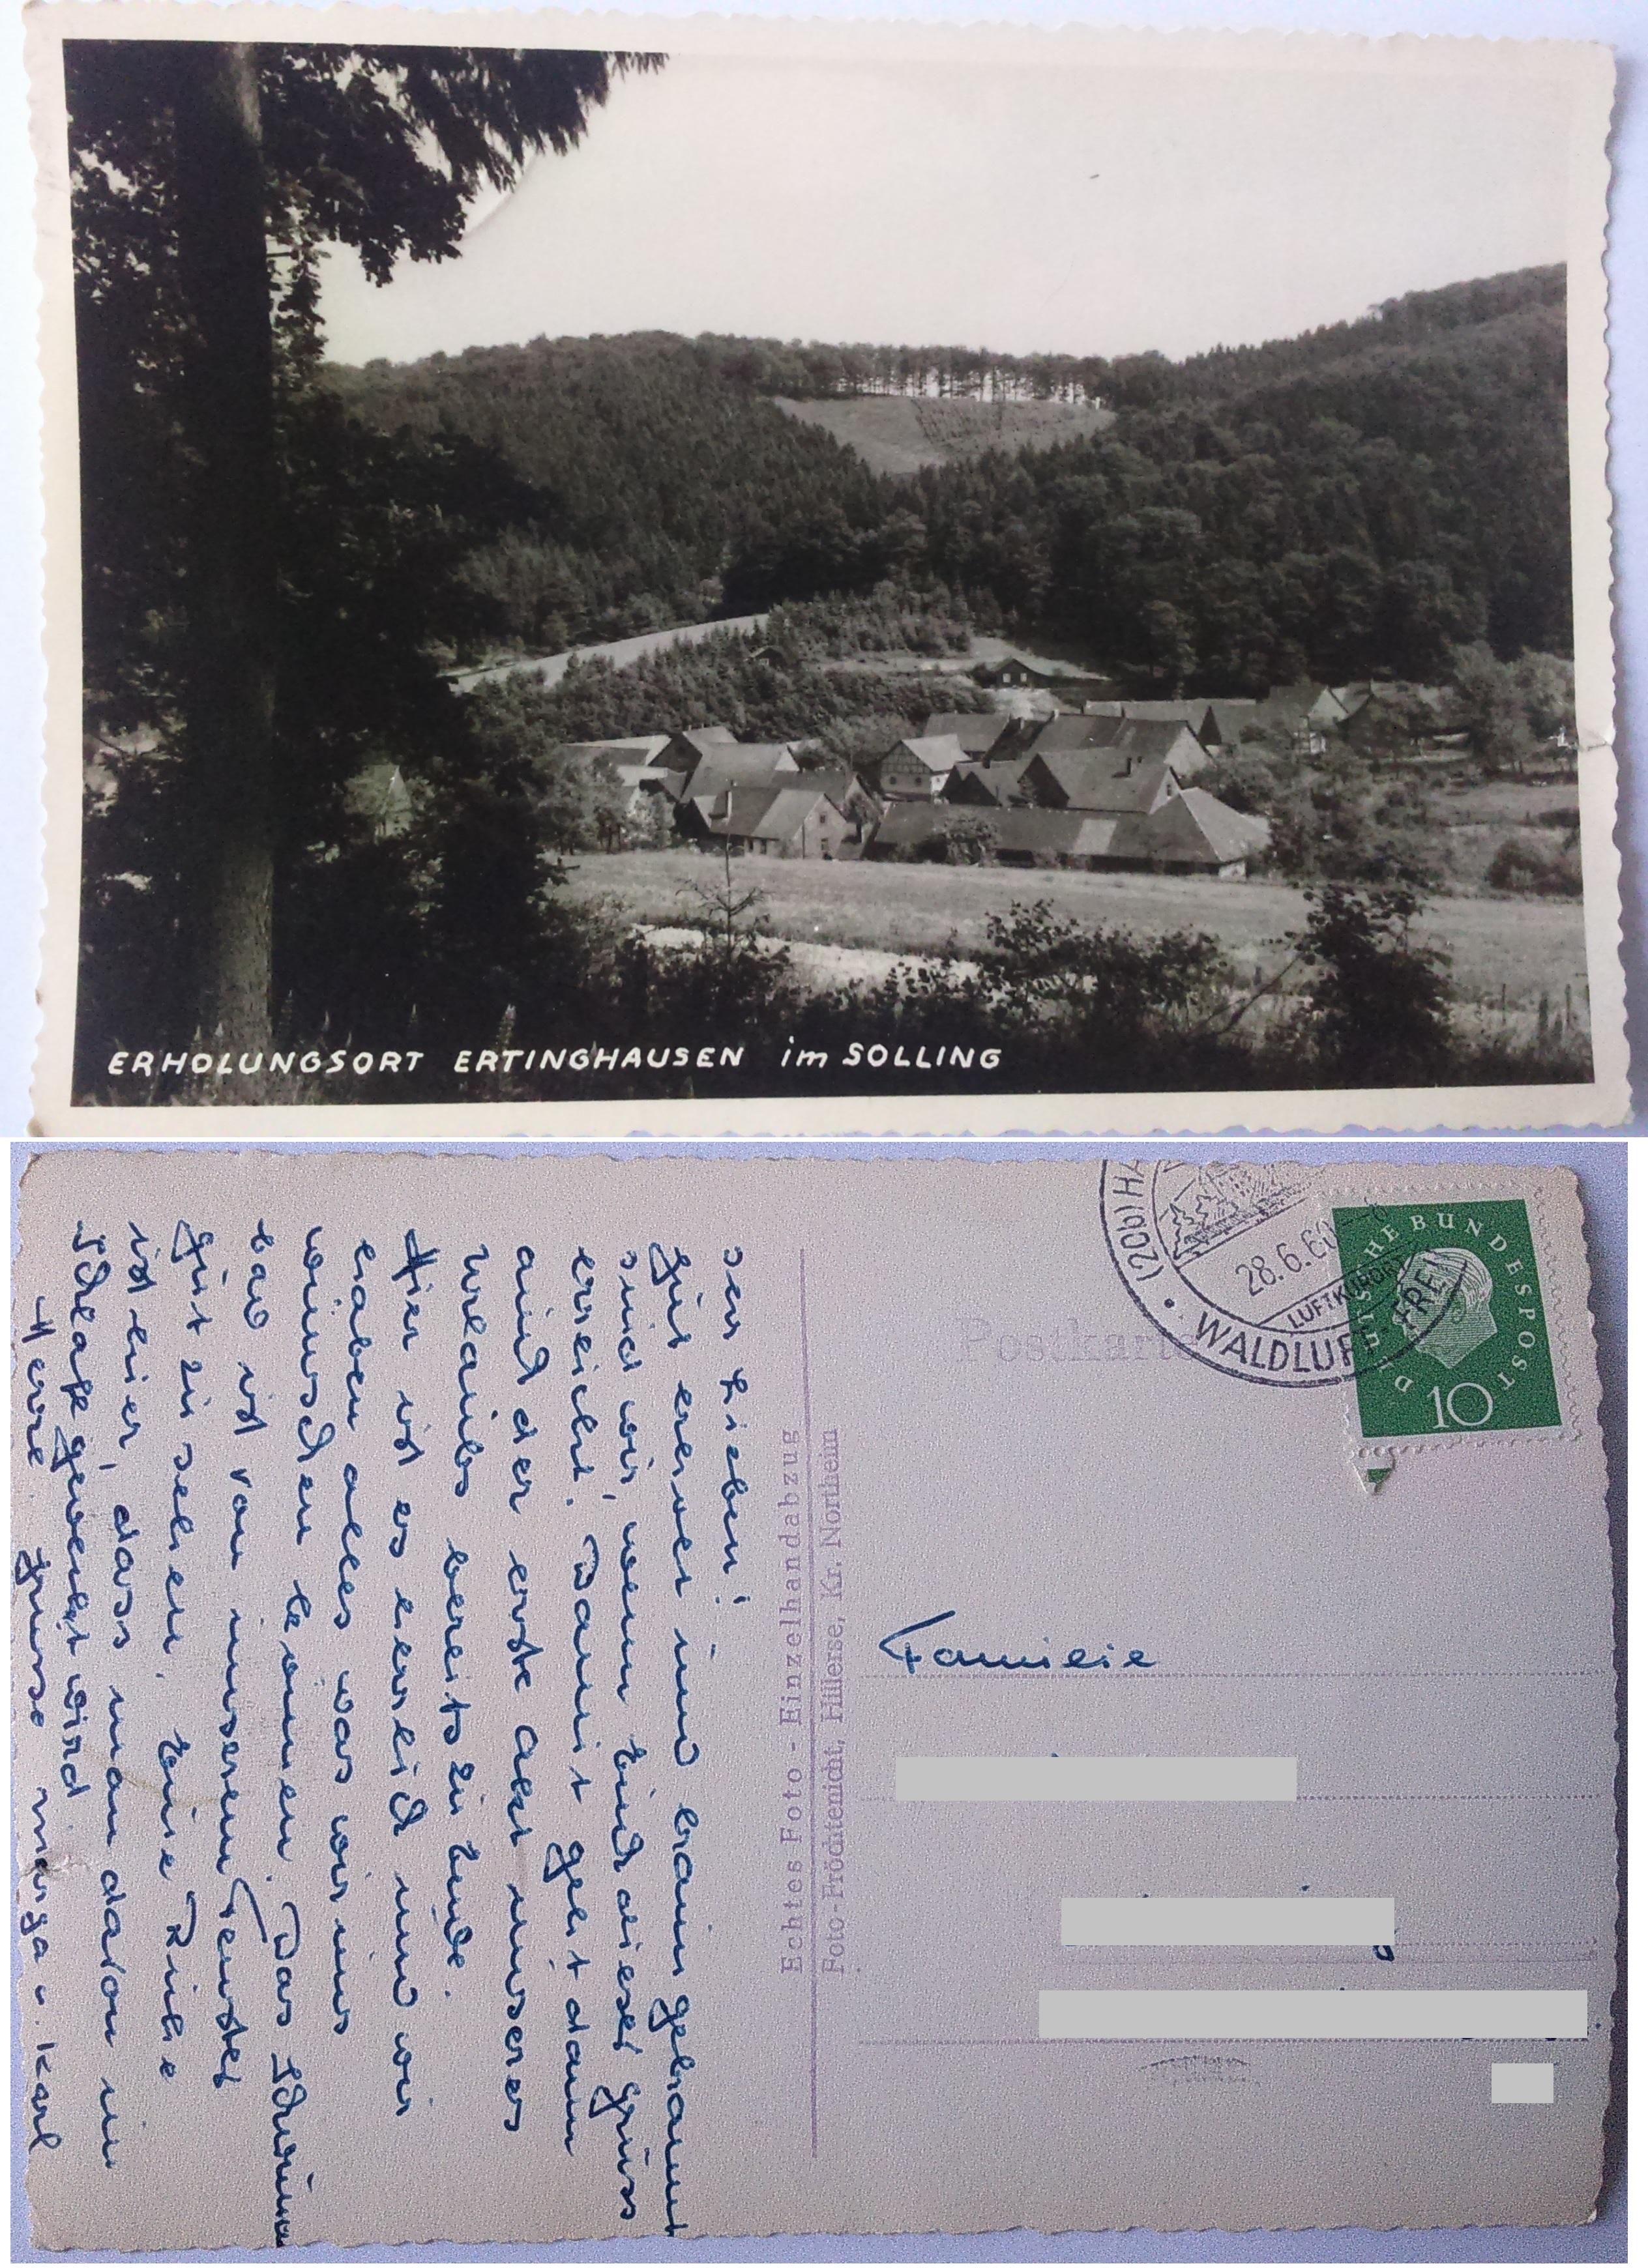 Erholungsort Ertinghausen im Solling (28.06.1960) both